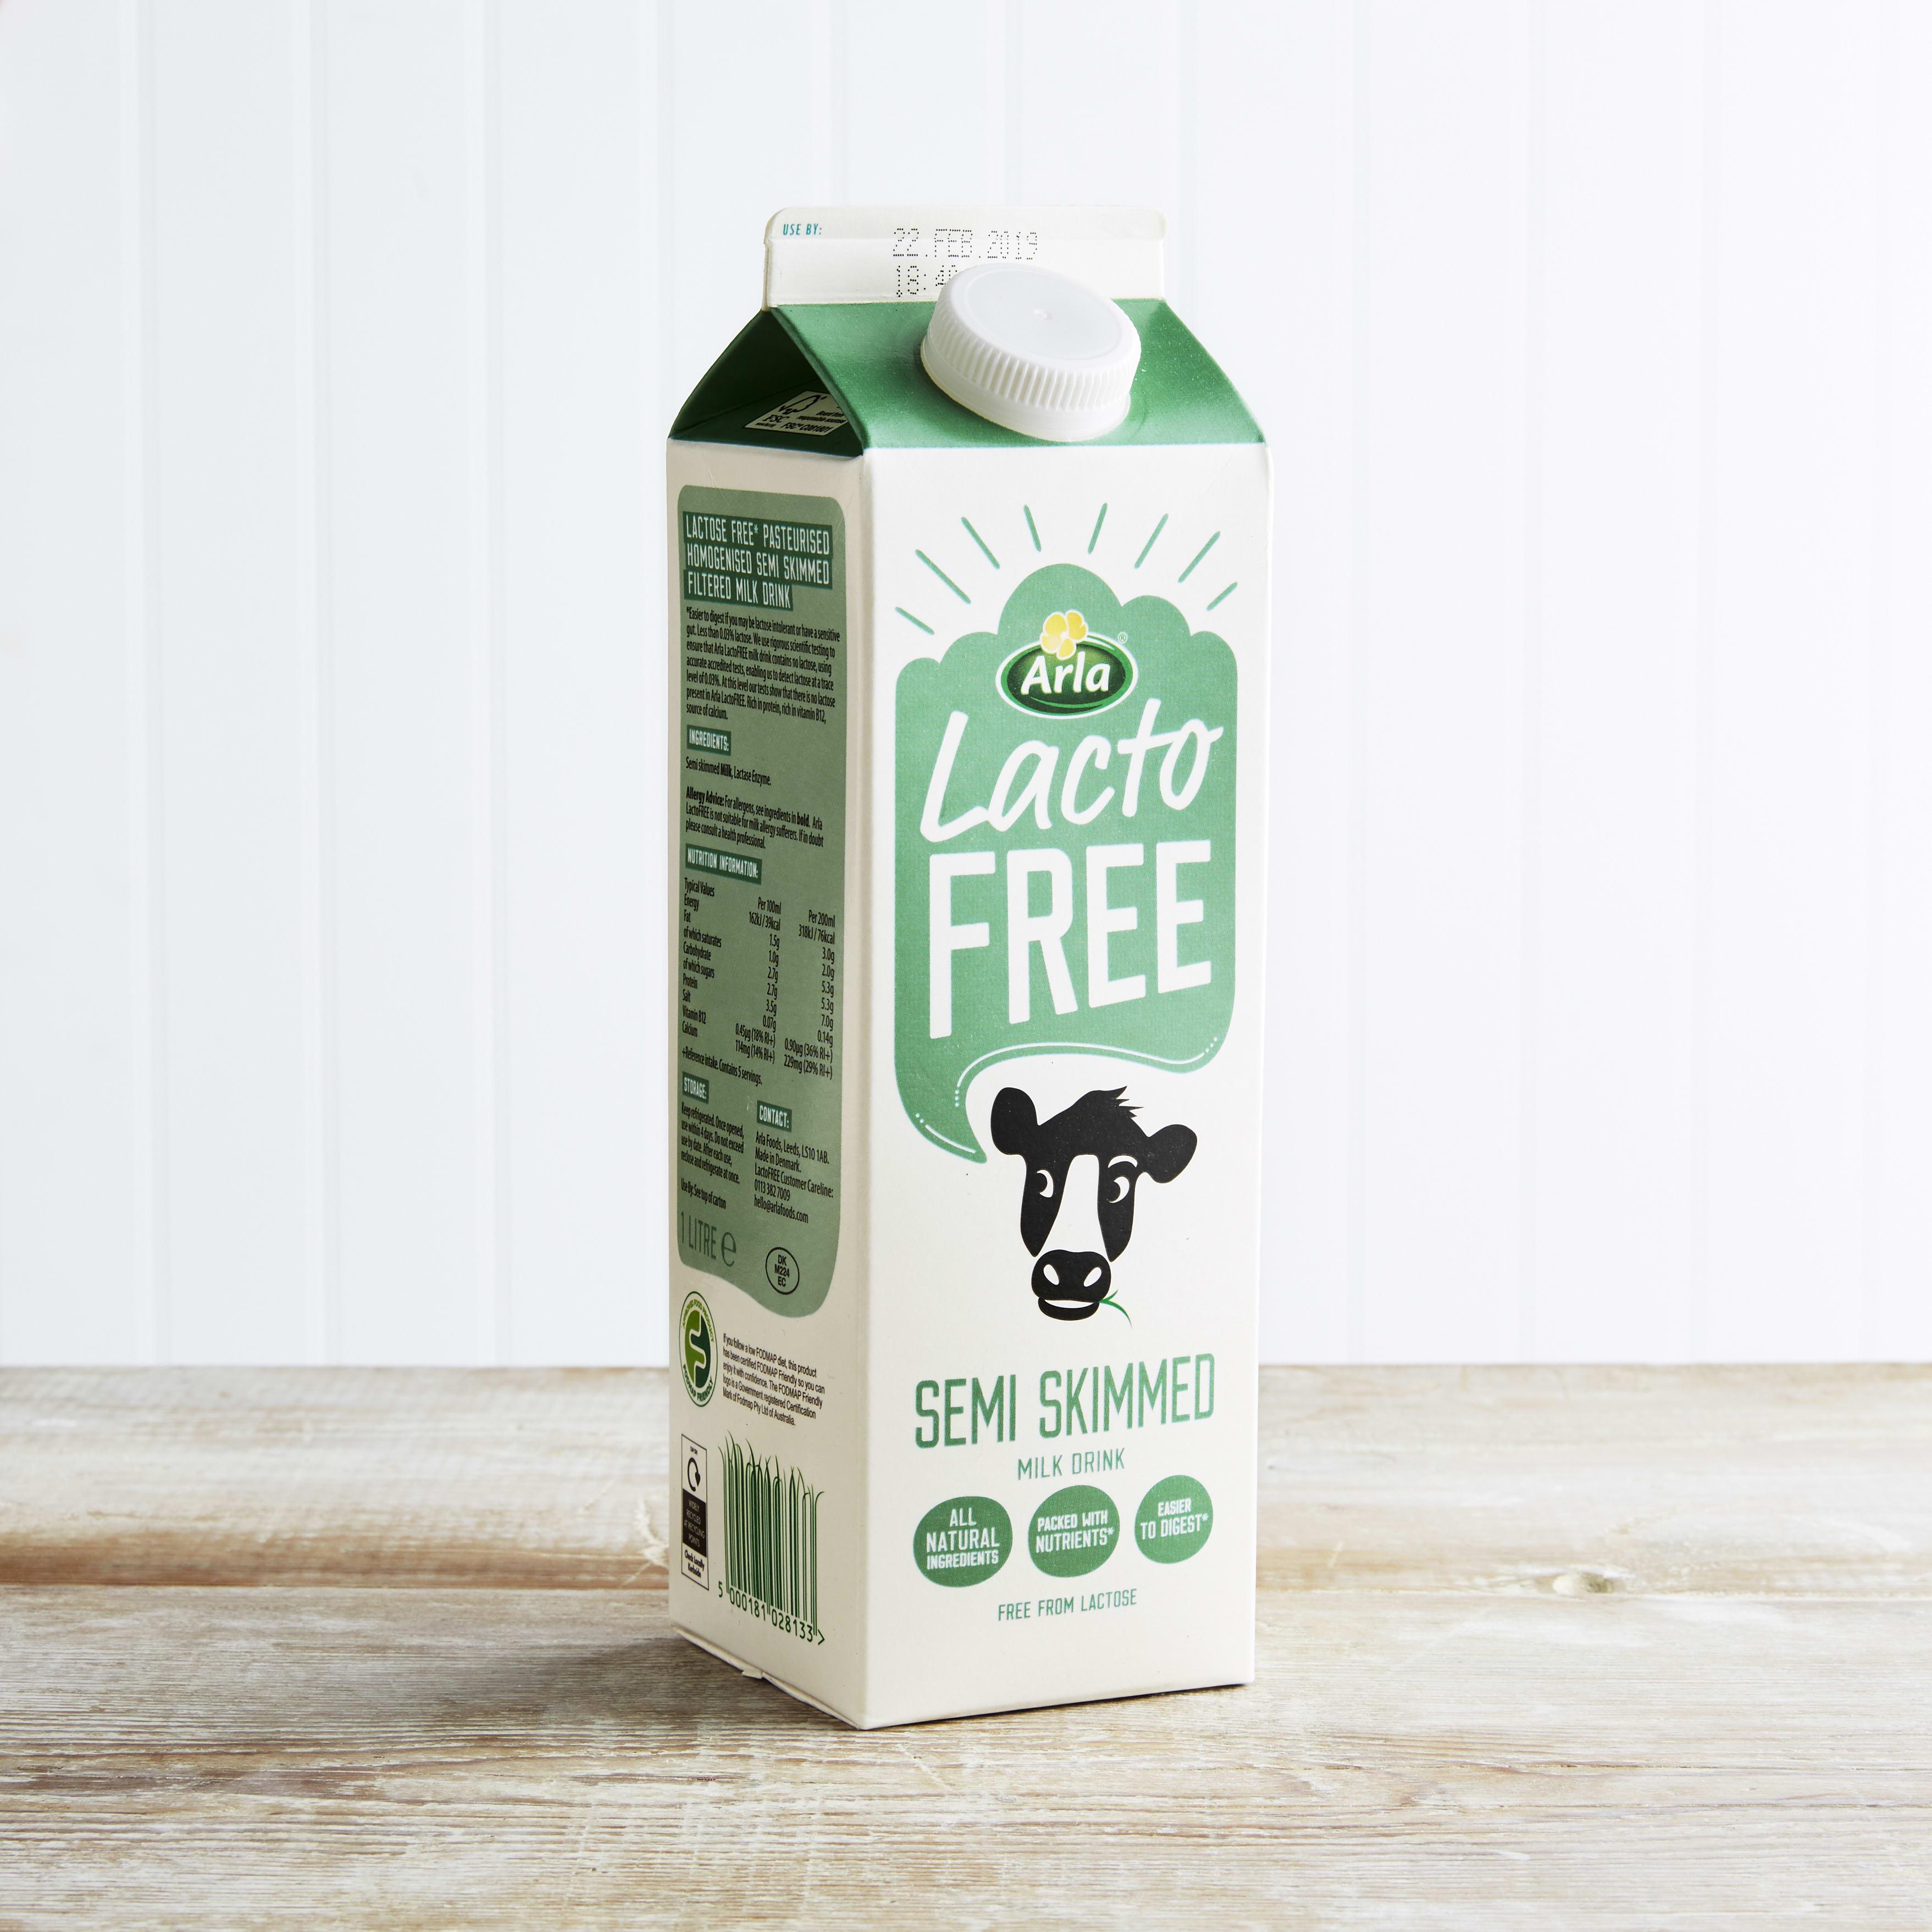 Fresh Arla Lactose free Milk, Semi Skimmed, 1L